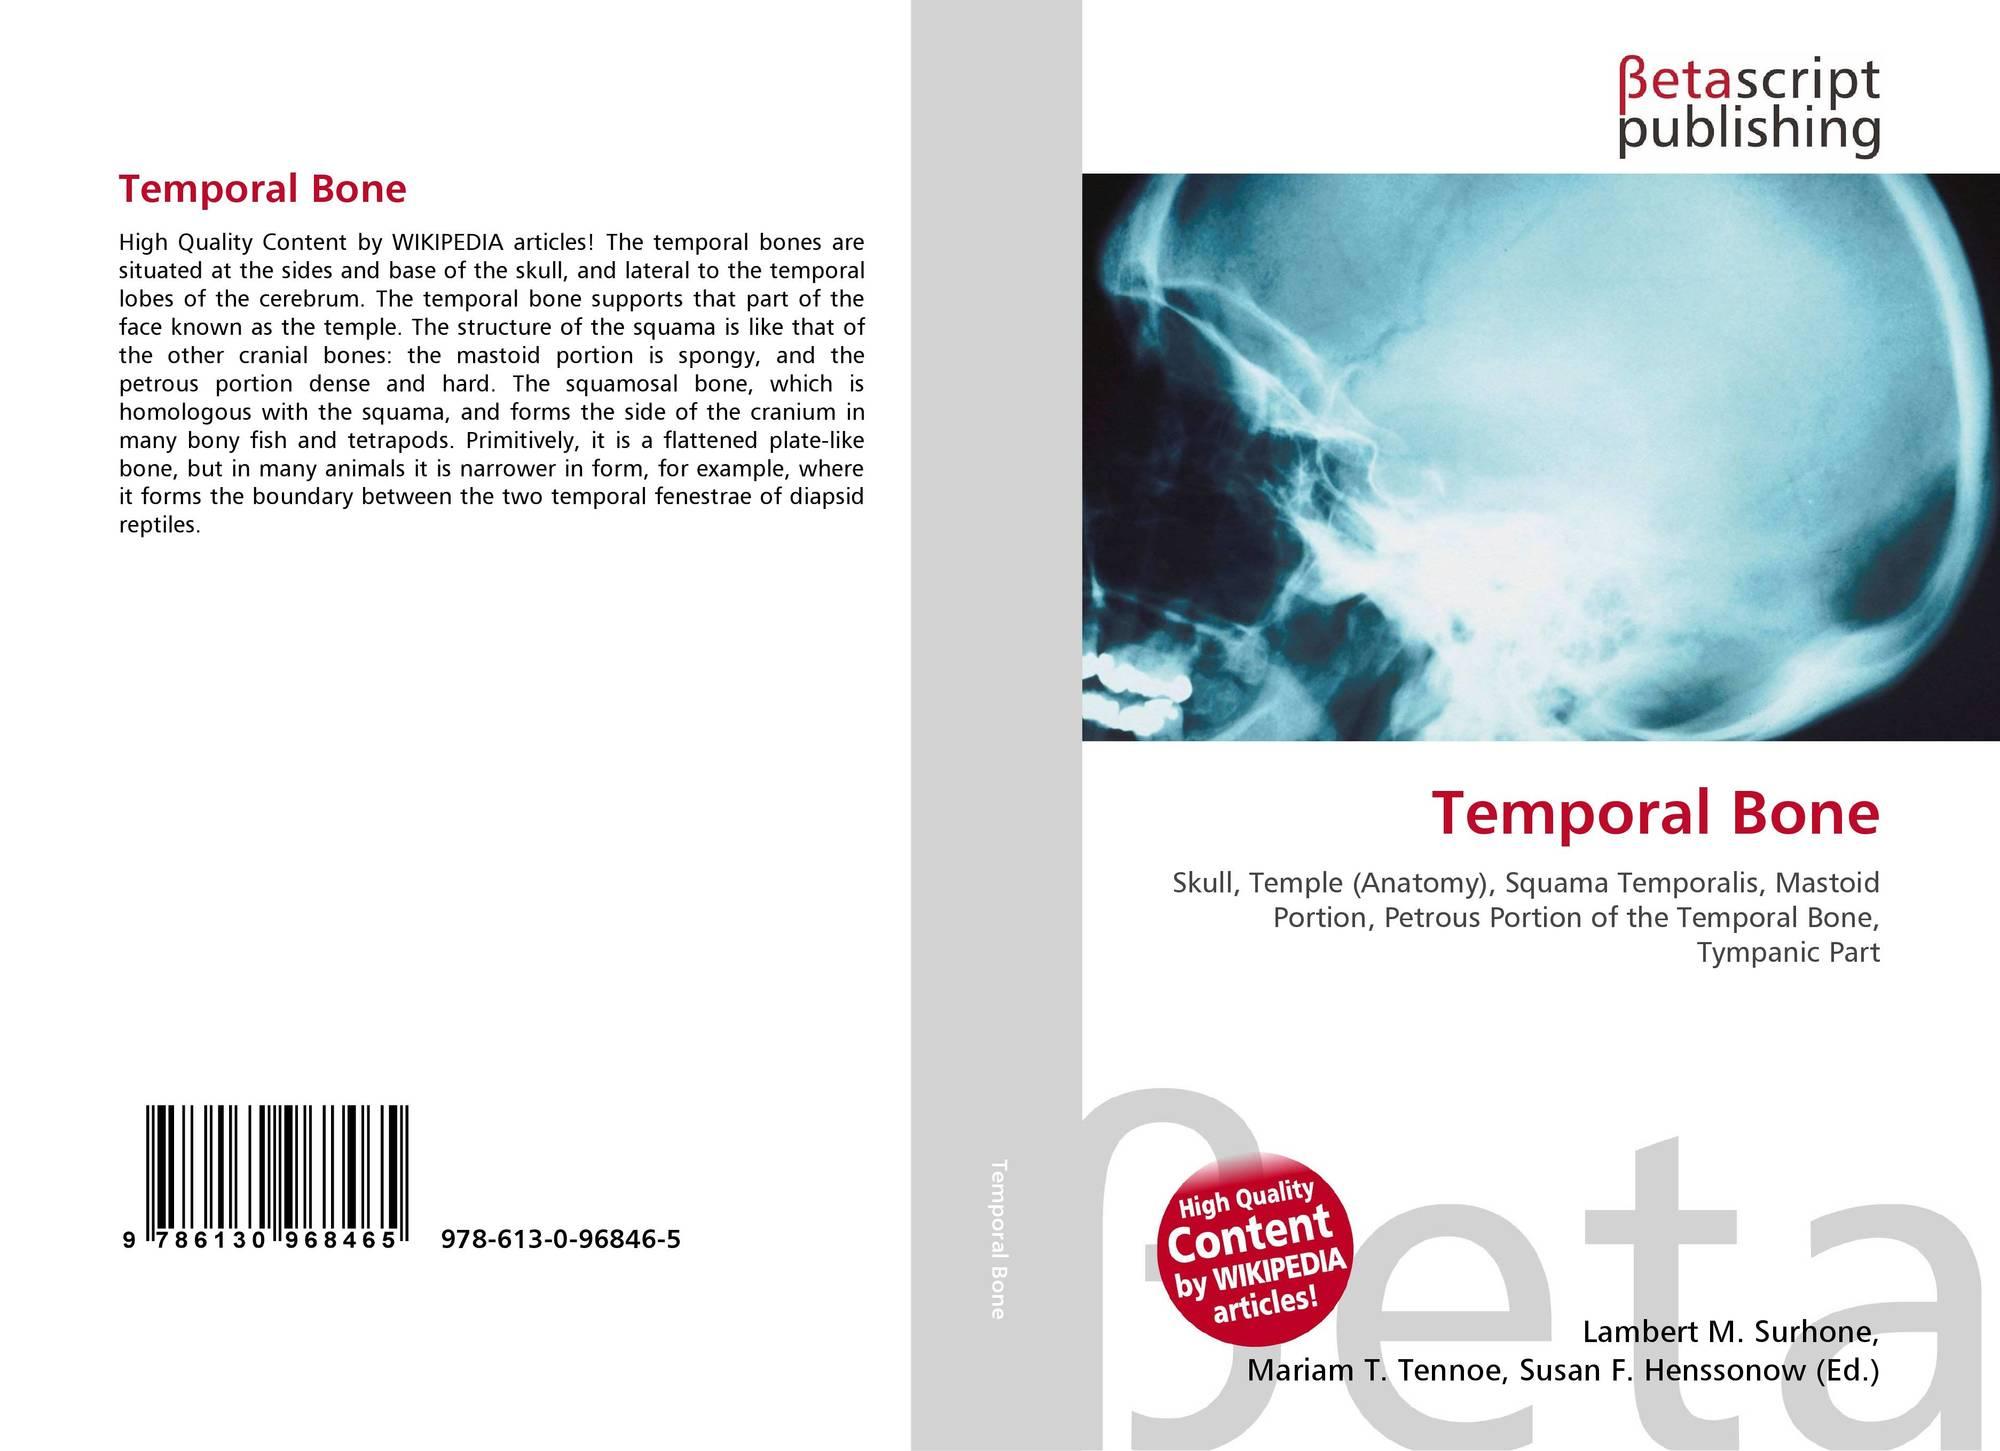 Temporal Bone, 978-613-0-96846-5, 6130968469 ,9786130968465